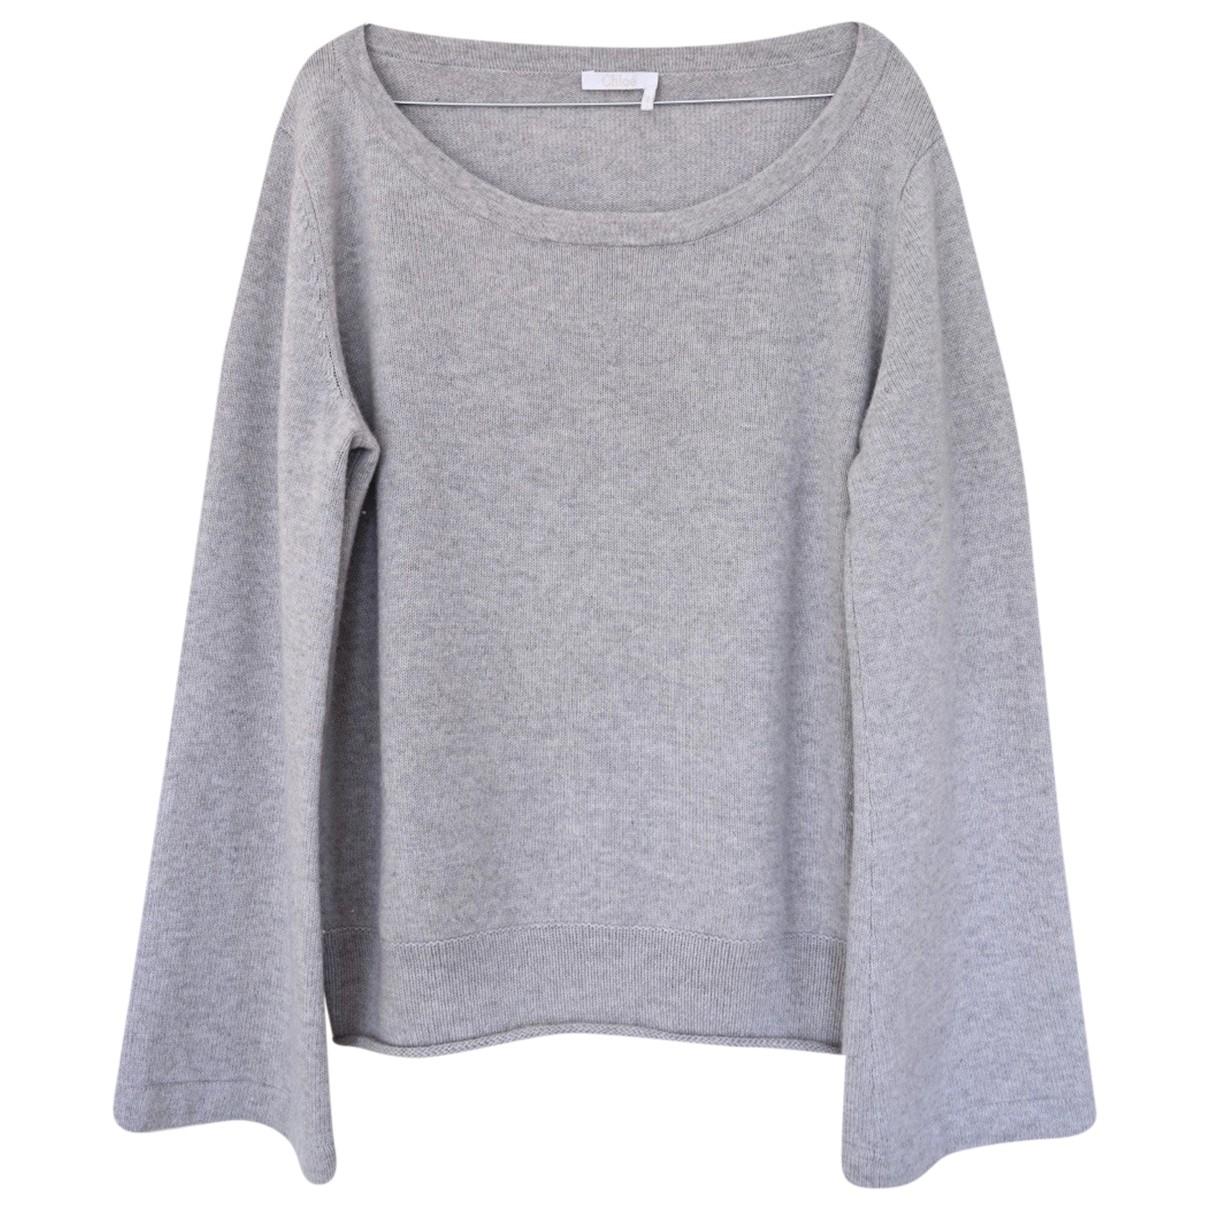 Chloé \N Grey Cashmere Knitwear for Women L International